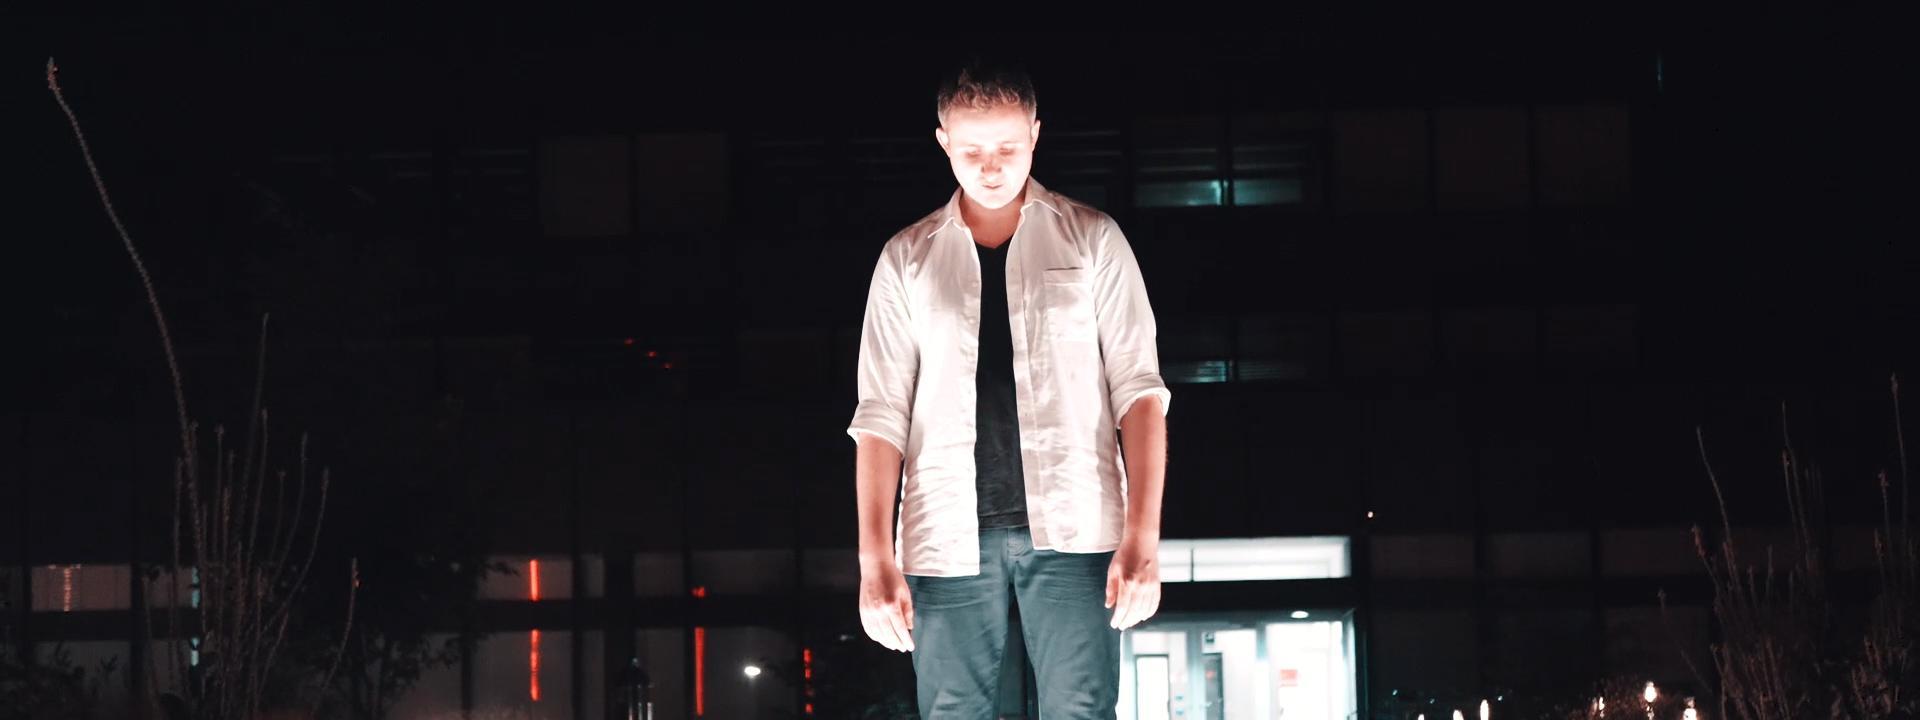 Blazin'Daniel - Nadine (Official Video) 60fps.00_07_11_26.Standbild072